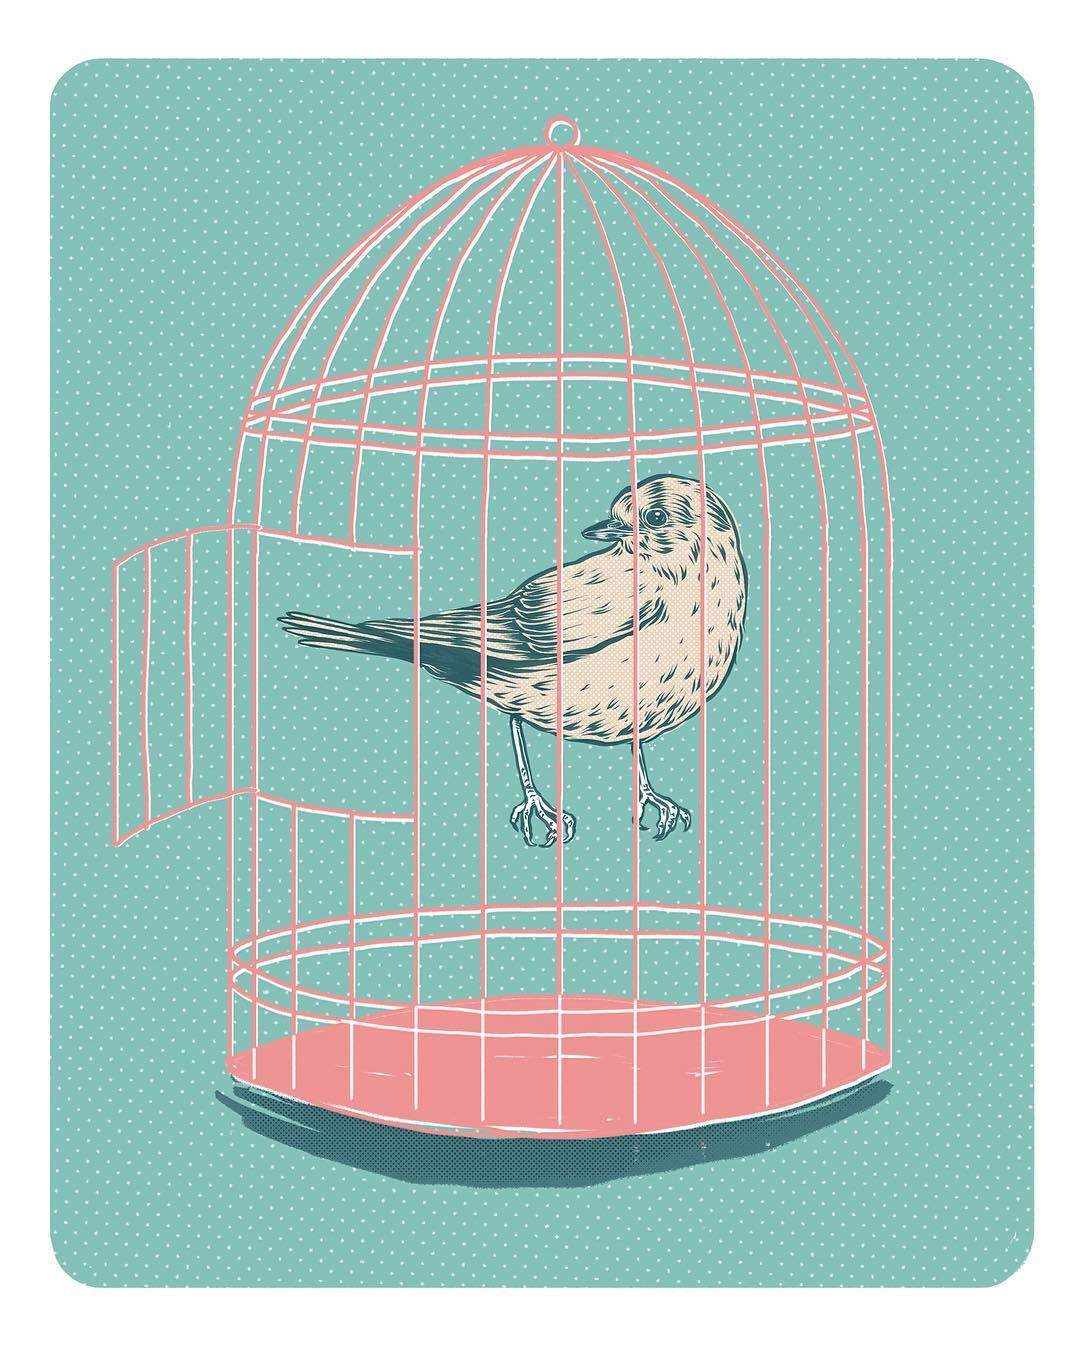 vogel.jpg